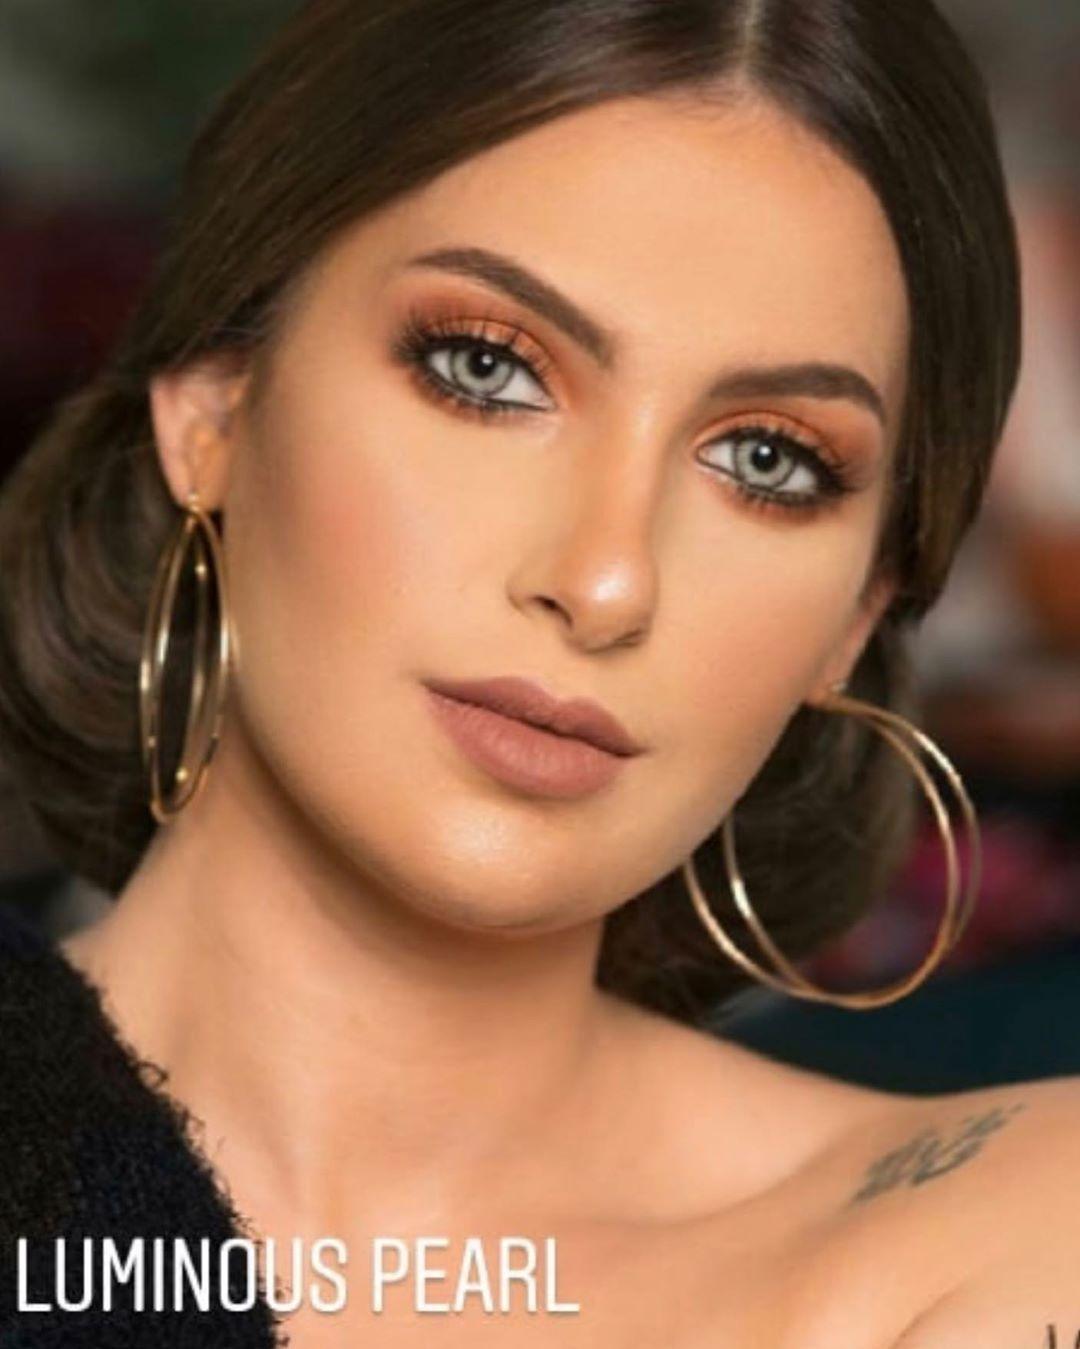 22 Likes 0 Comments Bella Contact Lenses Iraq Bella Contact Lenses Iraq On Instagram عدسات بيلا الاولى في العراق Luminou Hoop Earrings Earrings Lenses